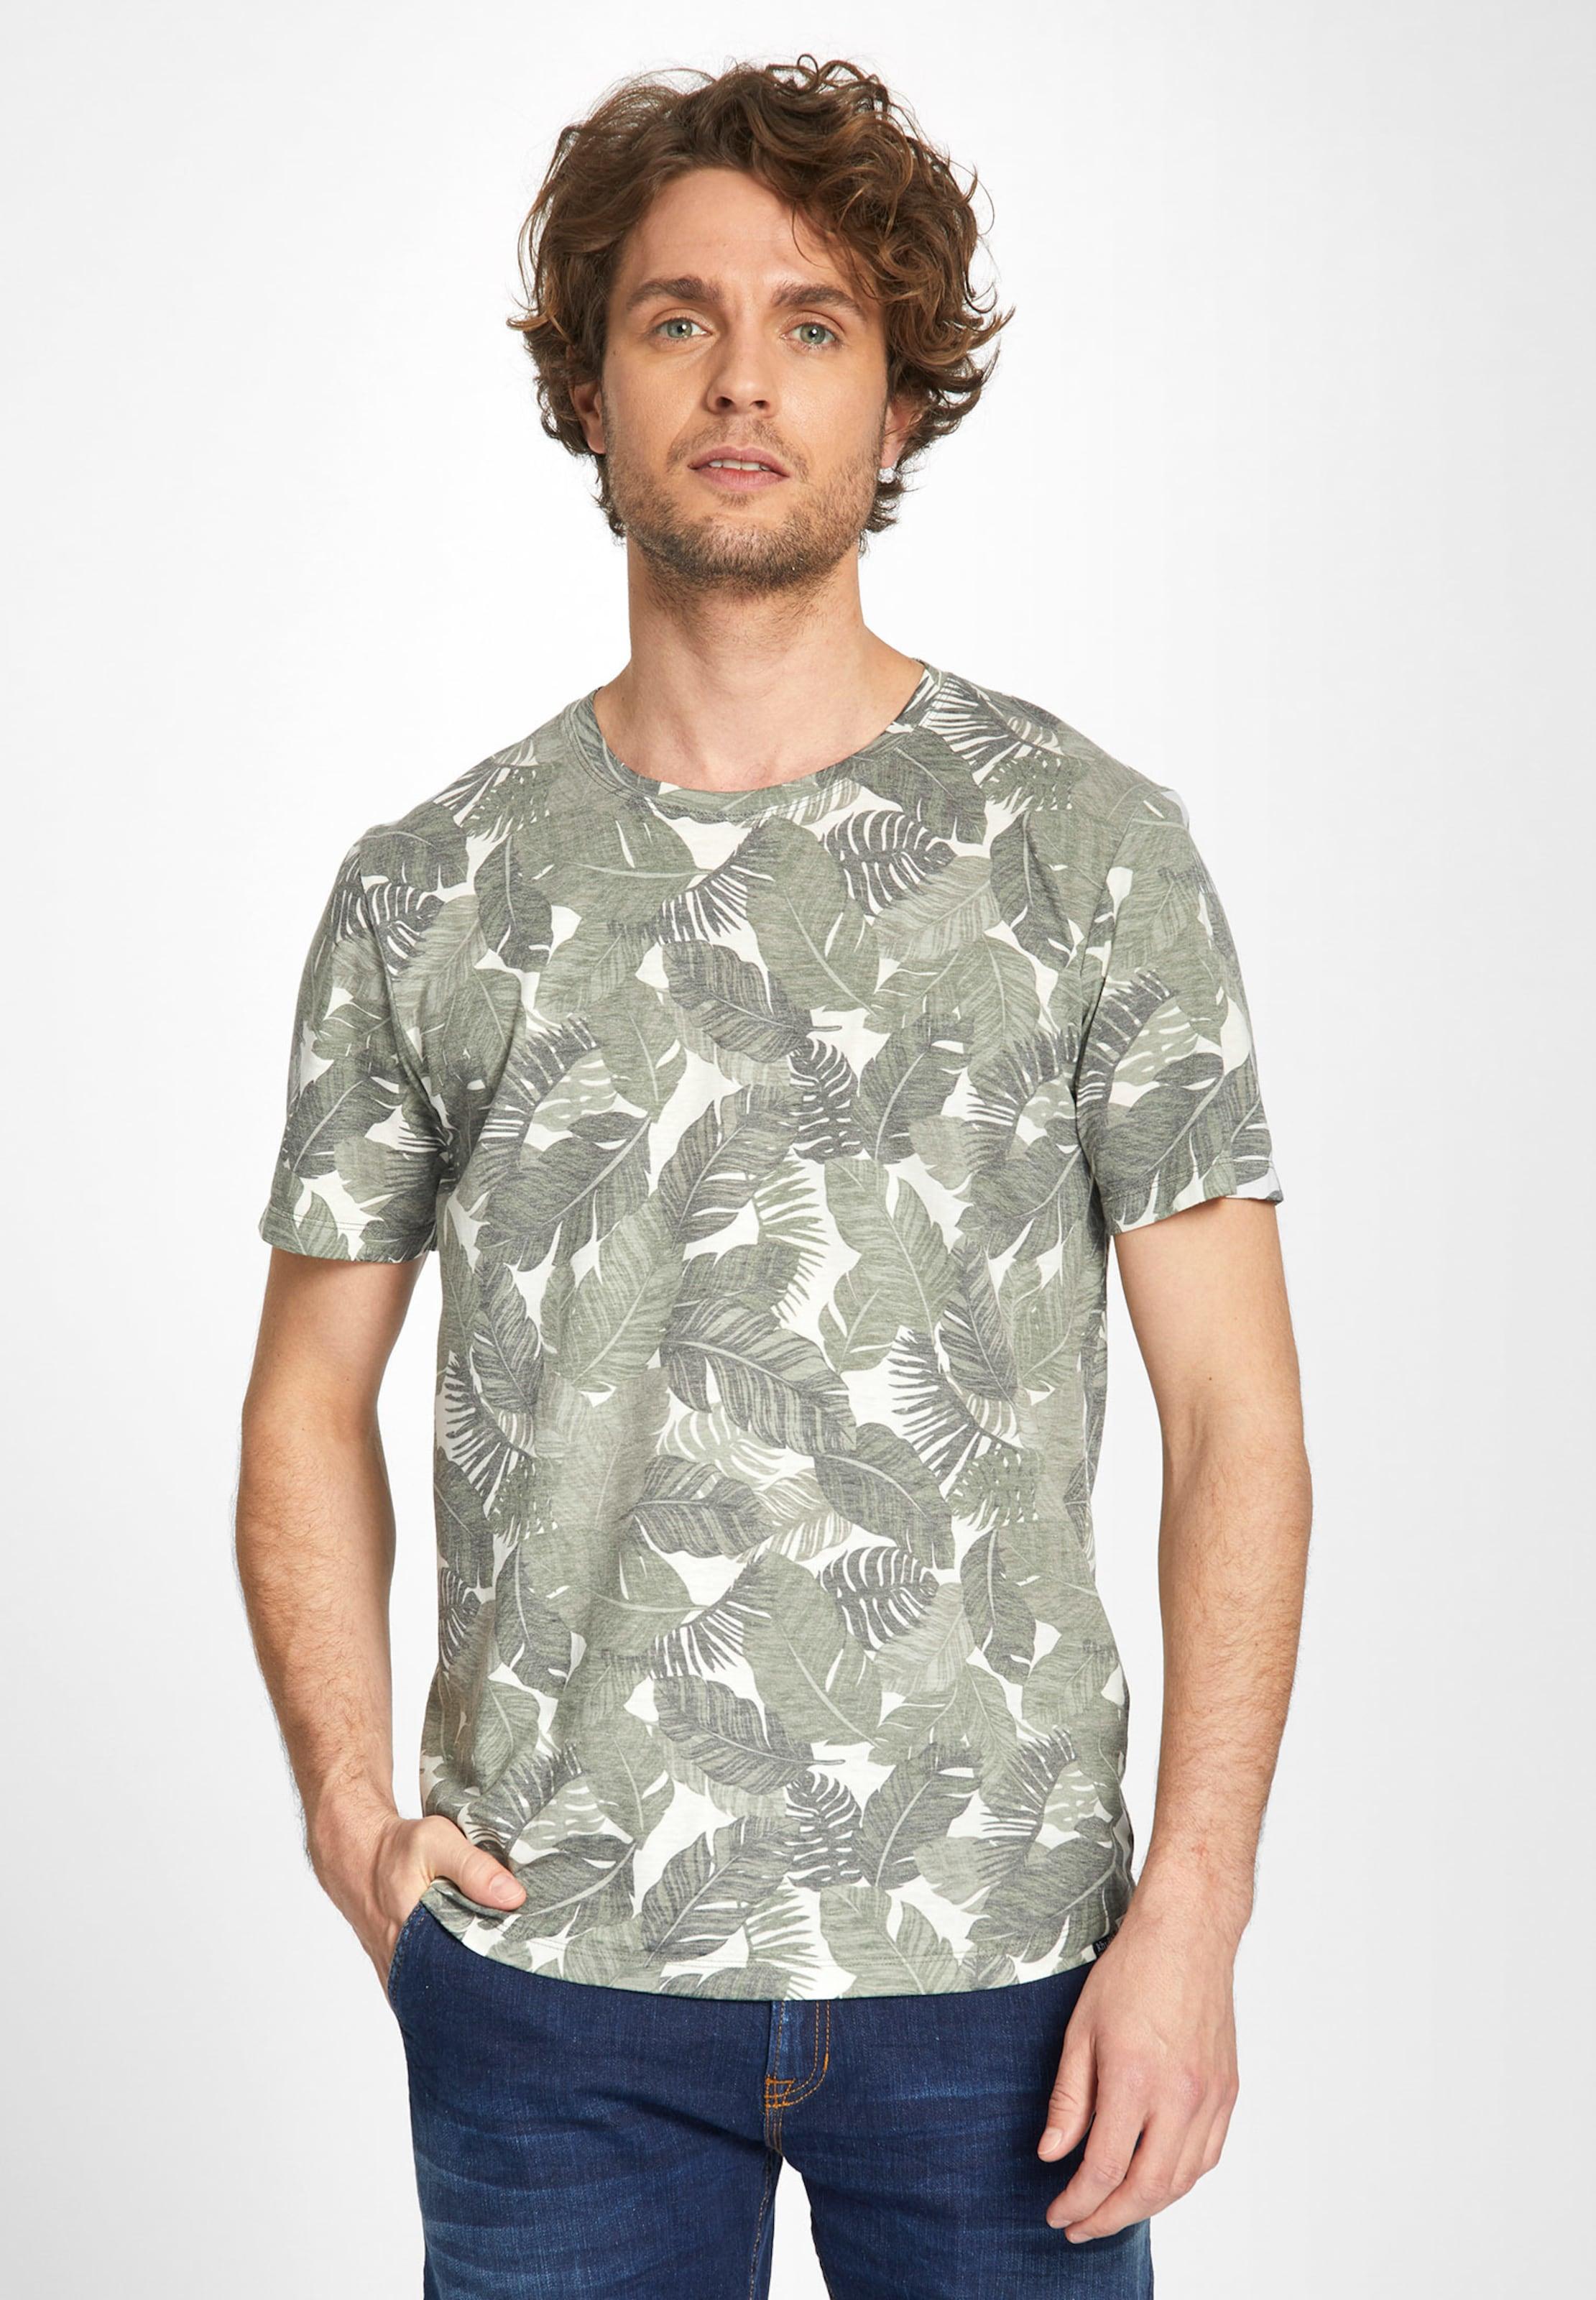 Khujo GrauGrasgrün Shirt Weiß 'tristan' In WdCorxBe